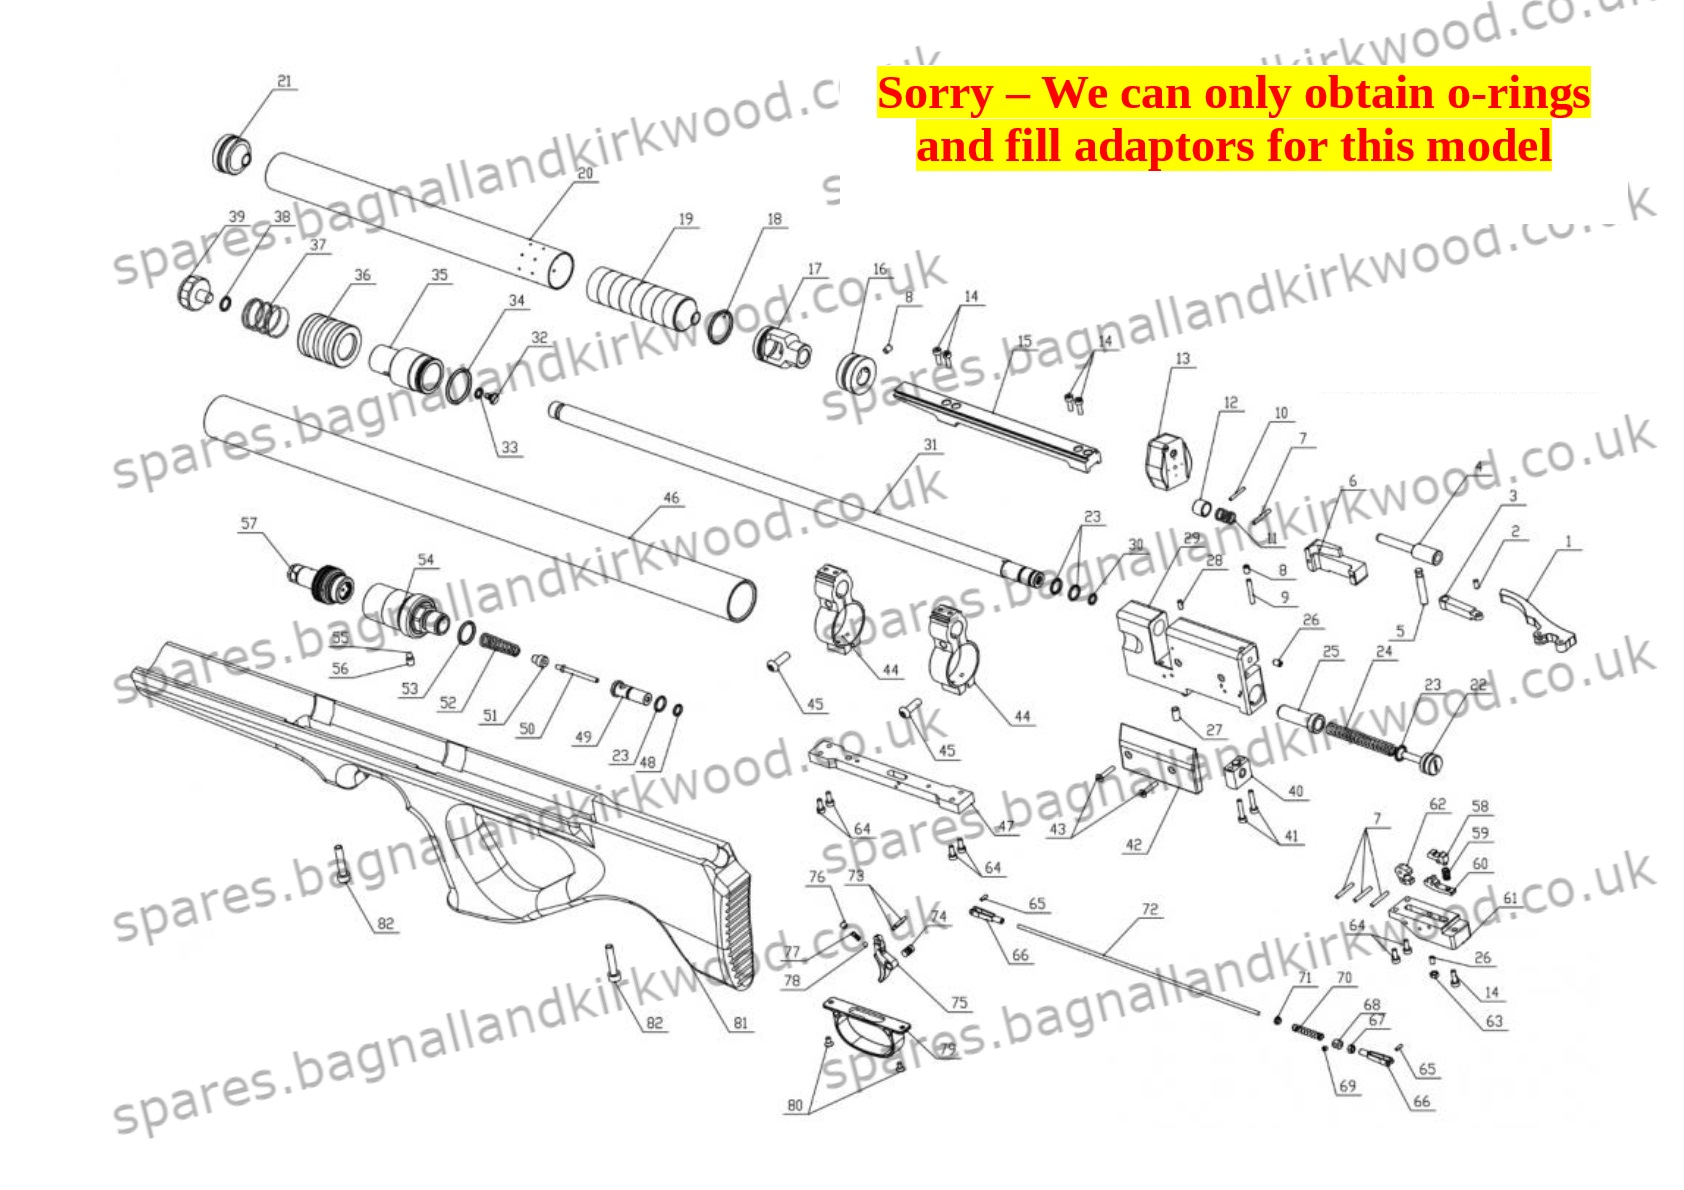 fox parts diagram basic wiring diagram u2022 rh dev spokeapartments com Residential Electrical Wiring Diagrams Light Switch Wiring Diagram